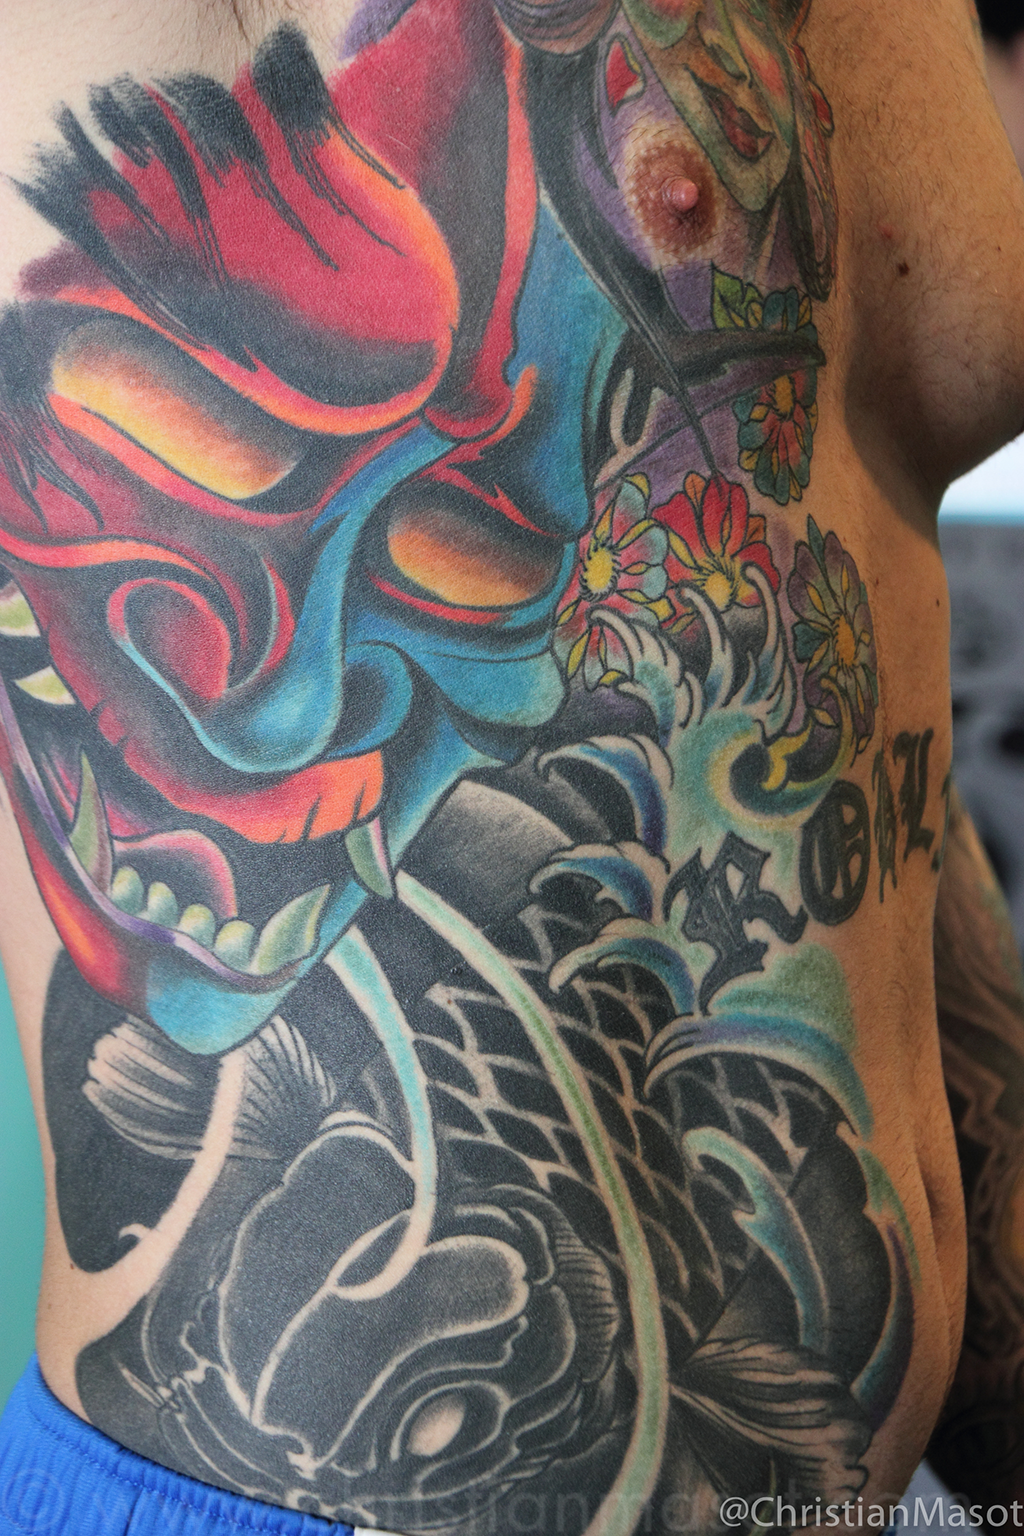 christian_masot_tattoo_19.png